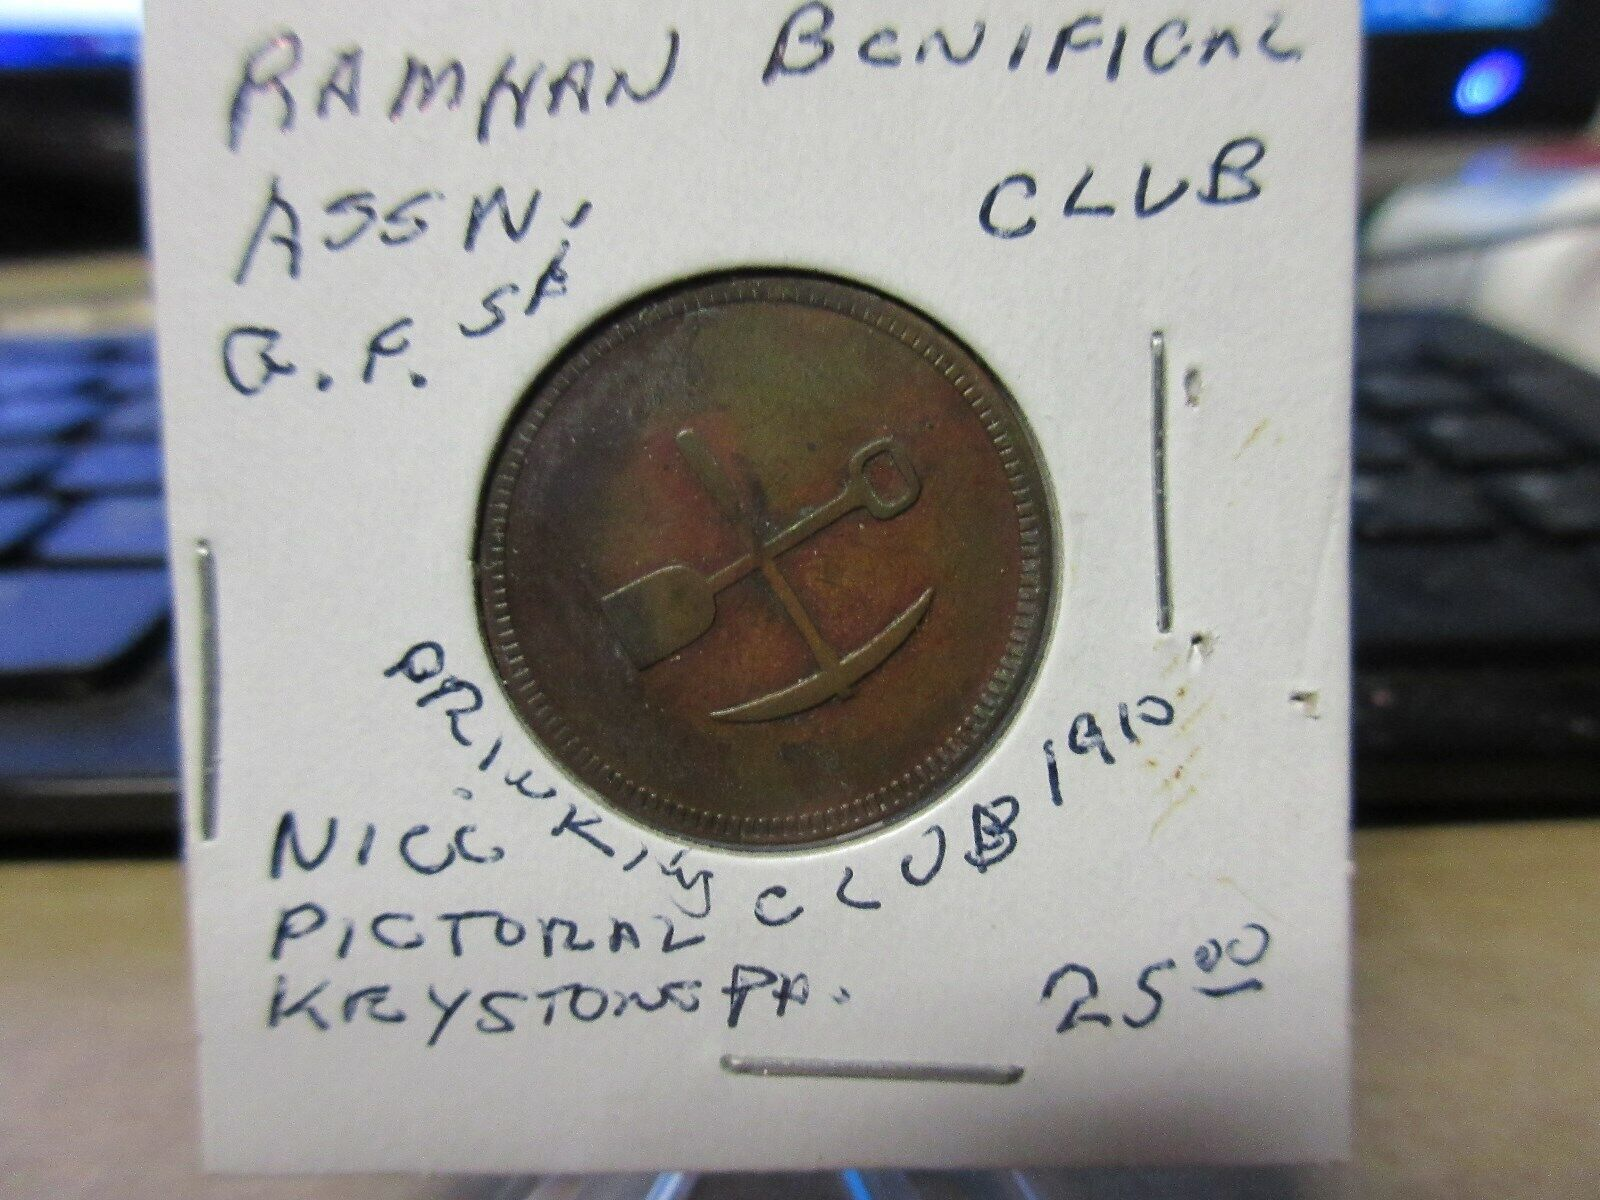 PA / Raman Beneficial Association Club GF 5 Token Copper 24 Mm - $19.95